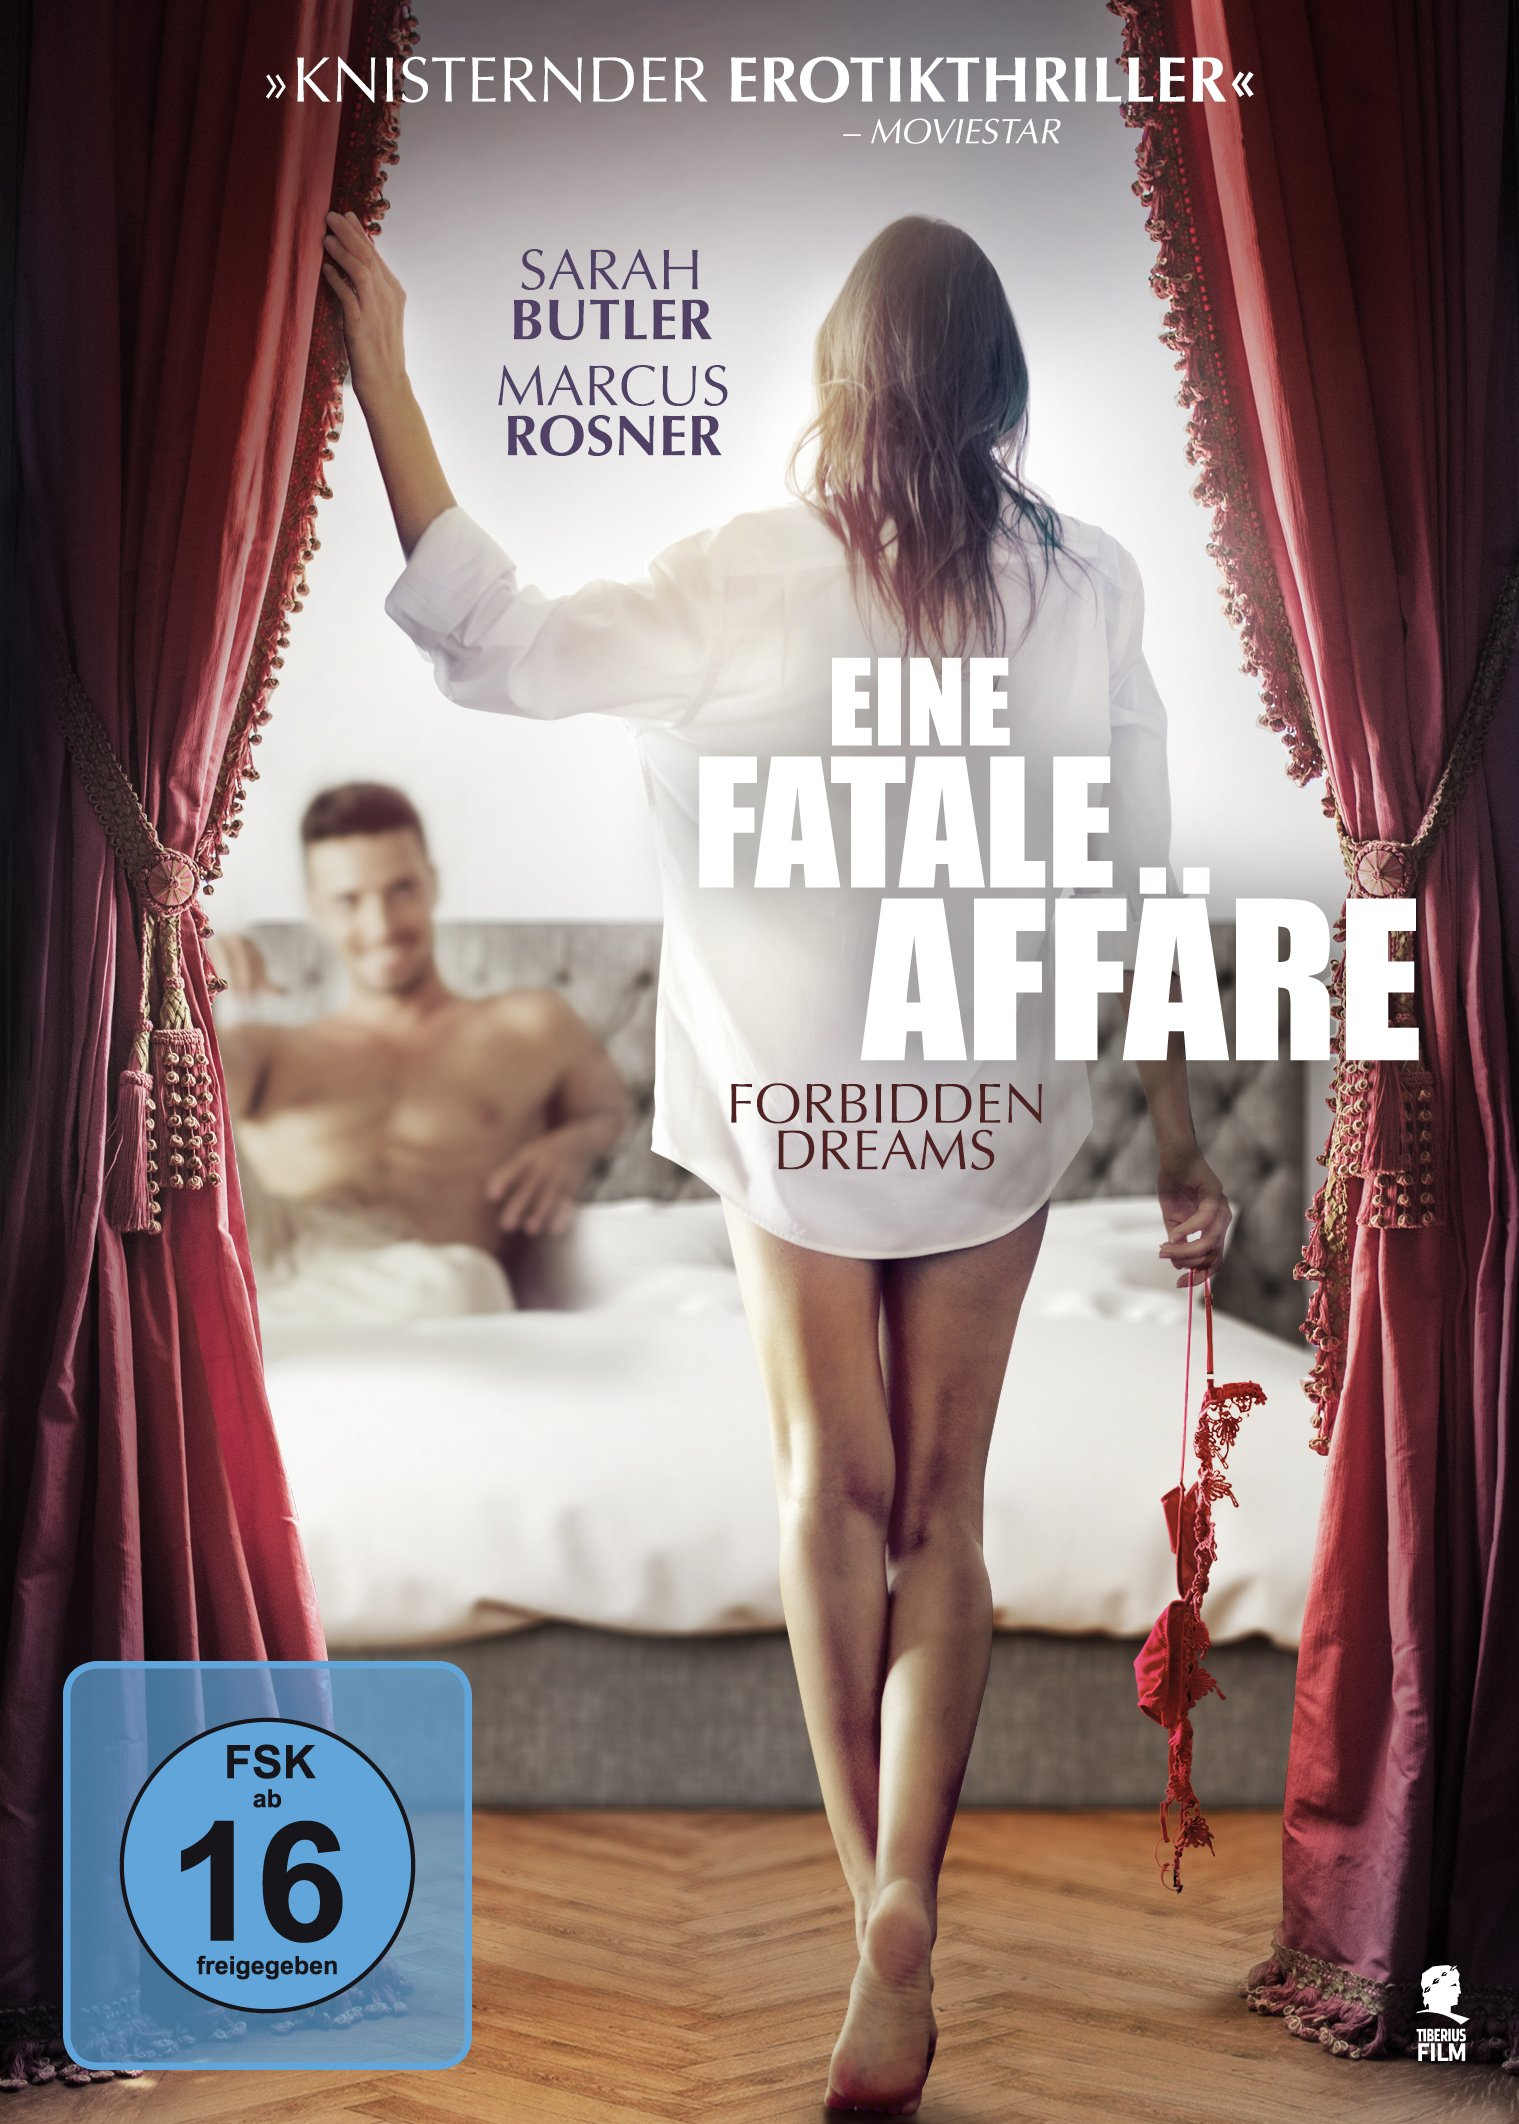 Eine fatale Affaere - Forbidden Dreams 2017 German Ac3 WebHdriP XviD-Ede